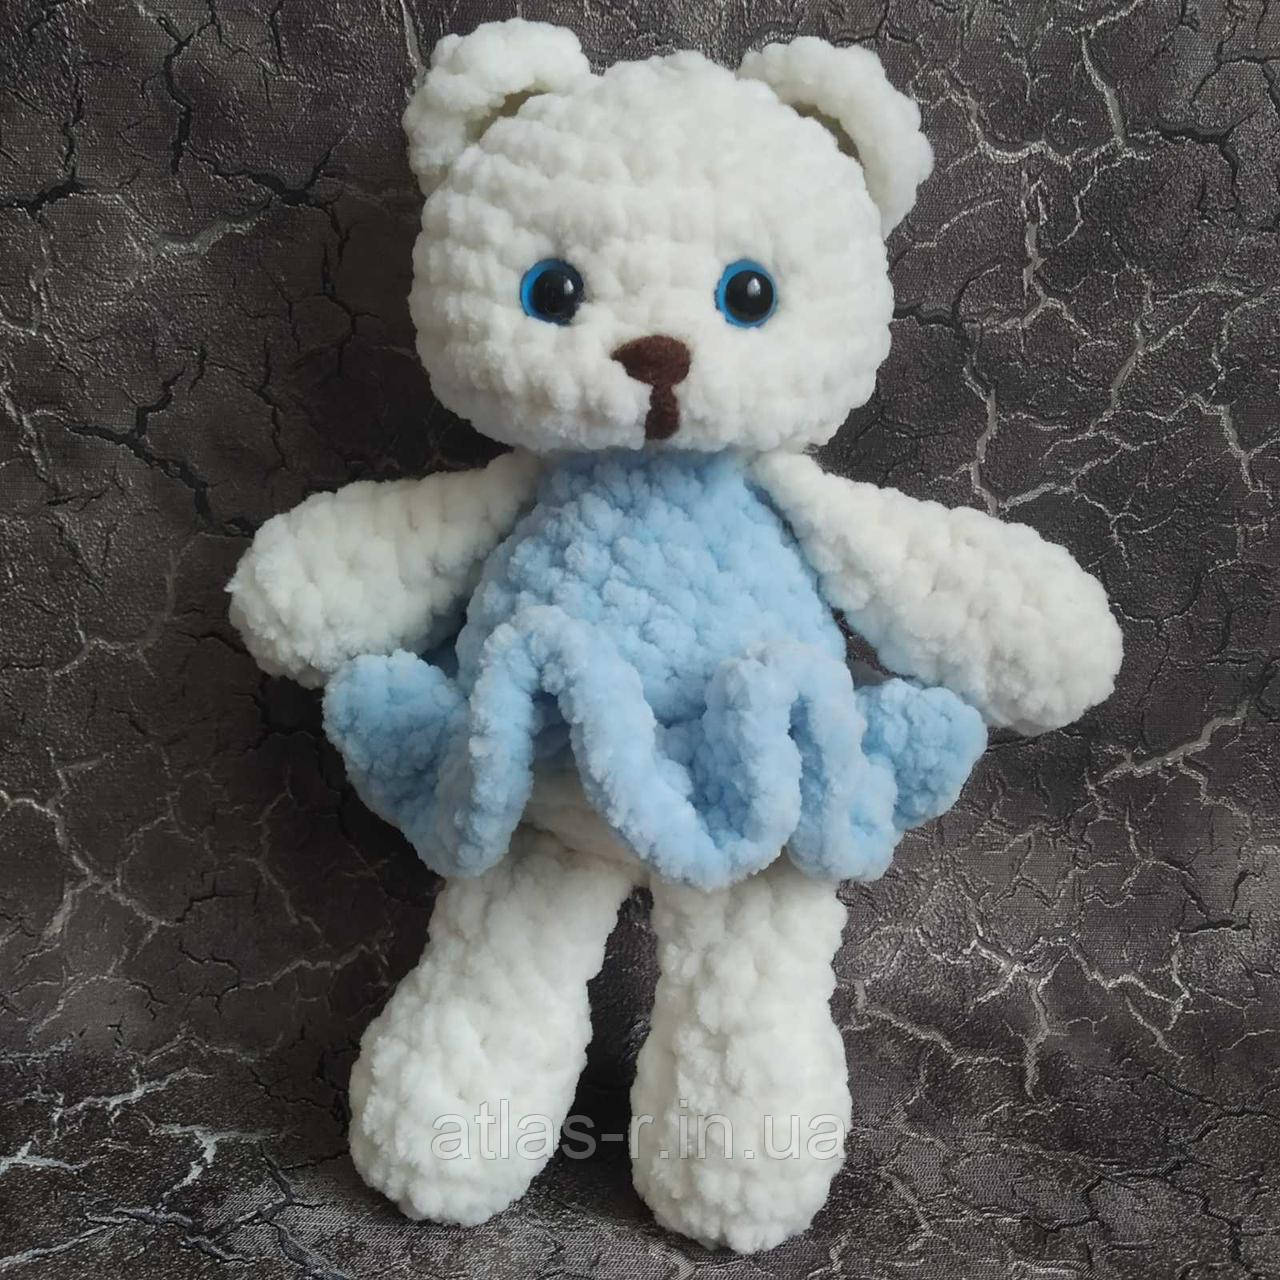 Ведмедик в блакитному 20см. Іграшка ручної роботи